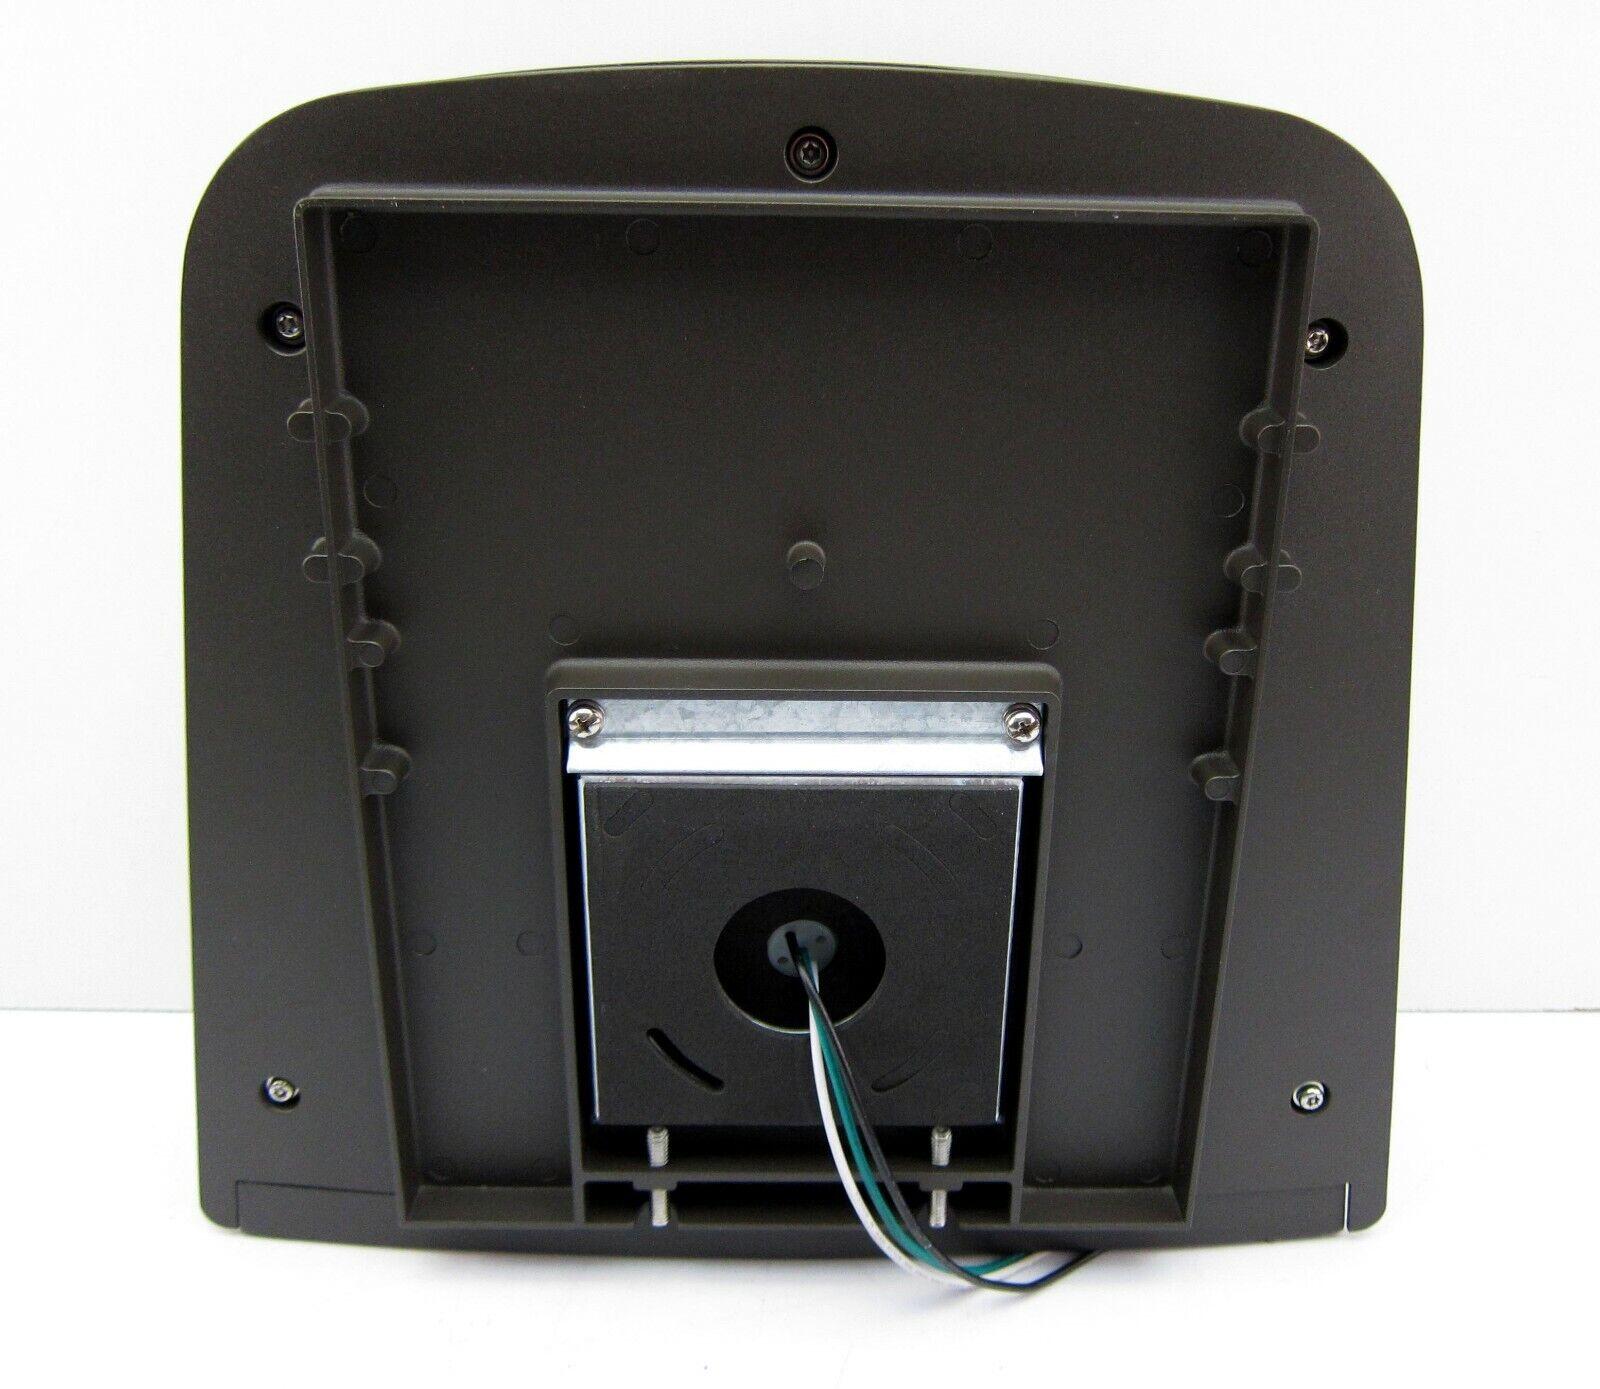 Morris 71326 LED Security Wall Pack Flood Light 86W 6500-7500 Lumens 120-277V